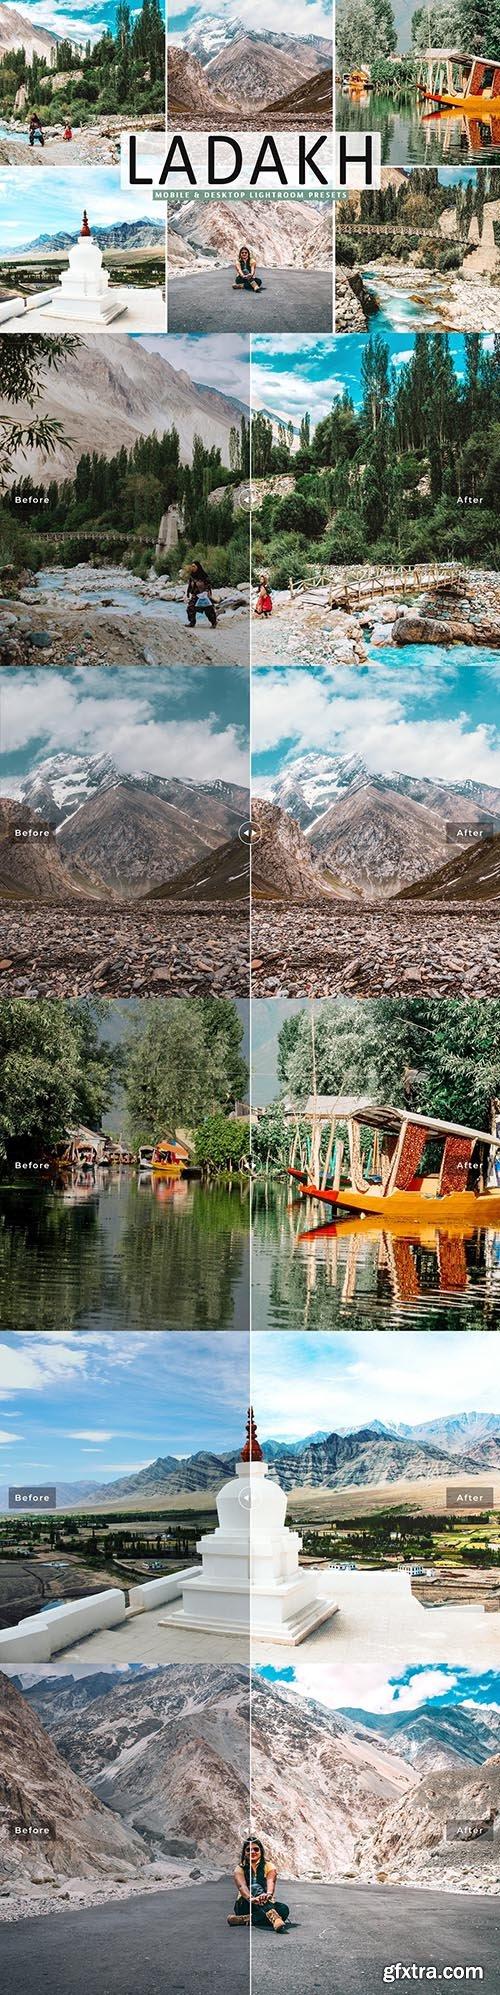 CreativeMarket - Ladakh Pro Lightroom Presets 5333639